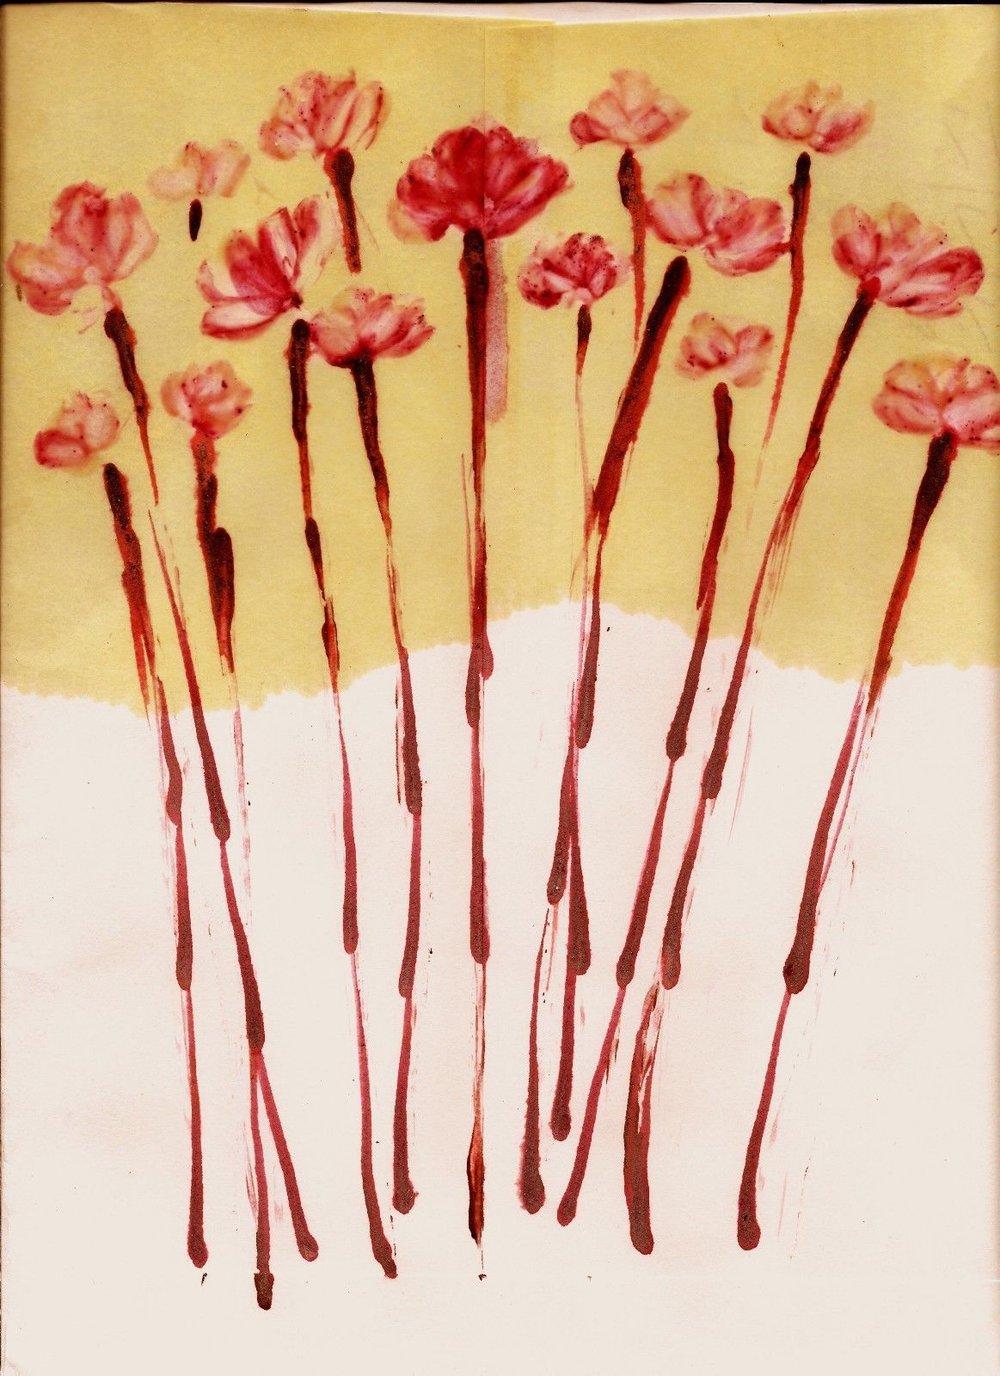 Lian Kool Aid art on manila envelope d.jpg